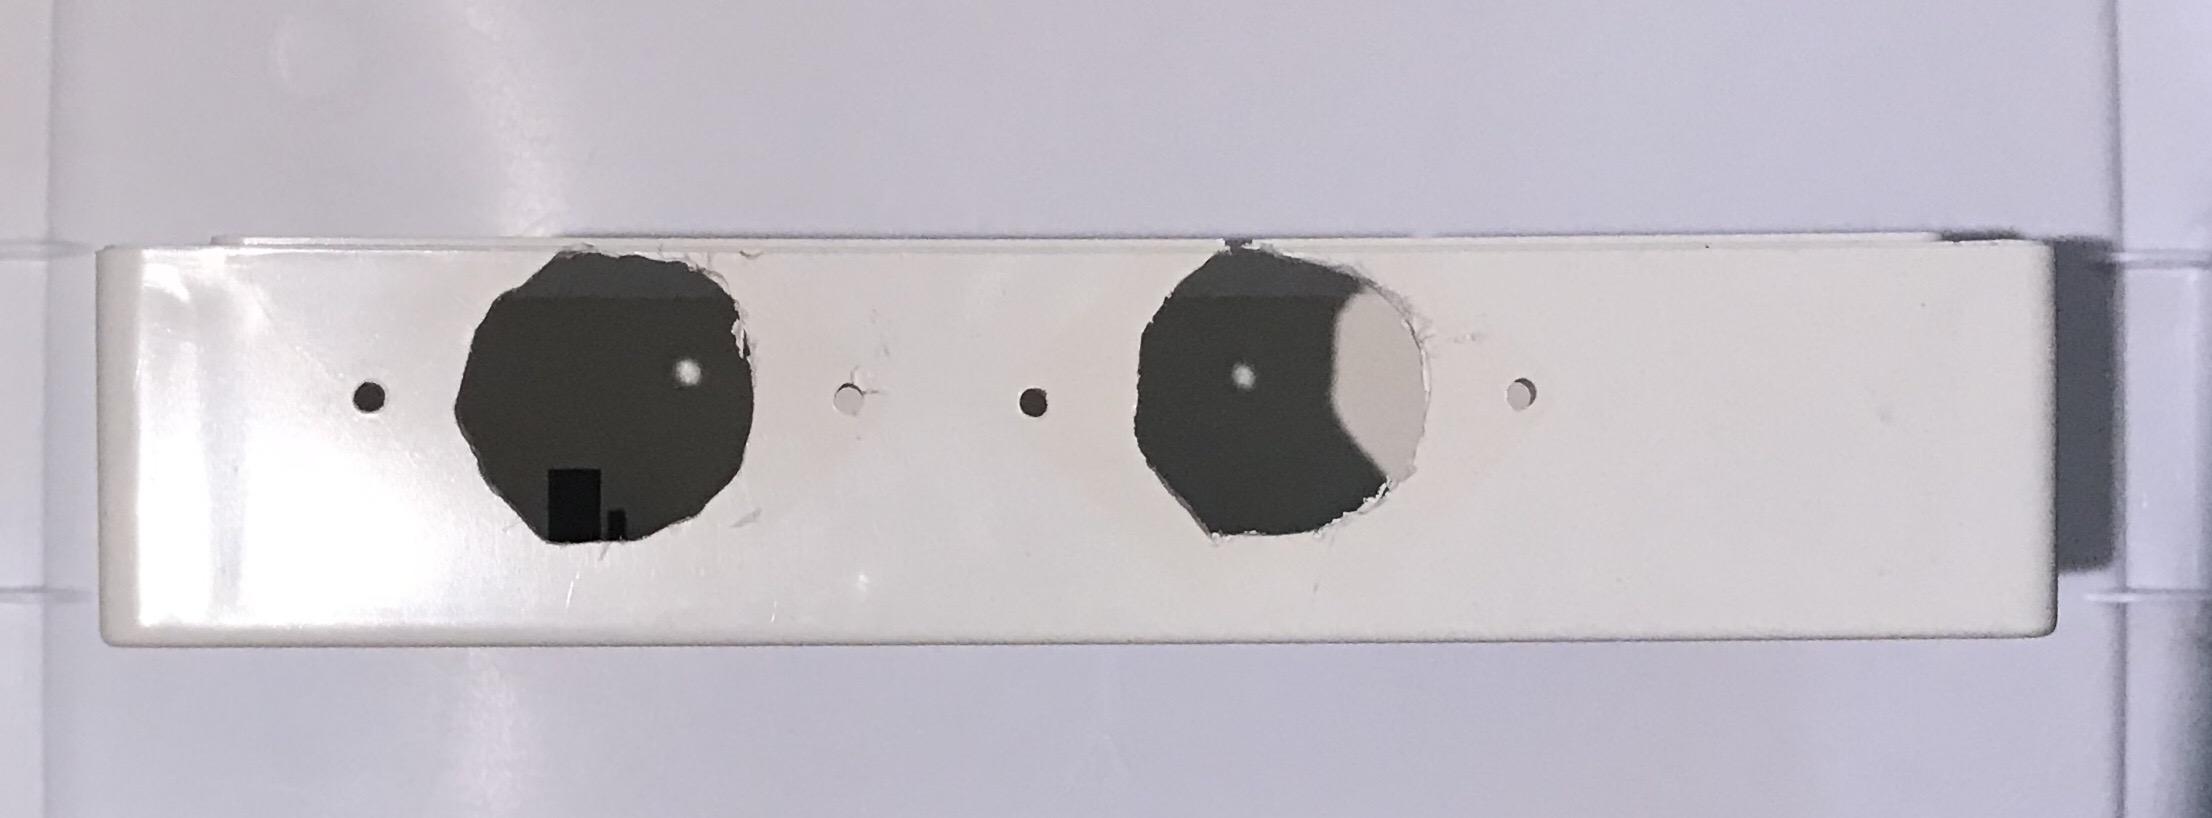 components_DEA46F69-B5C5-415A-99EC-89761AAAEA3C.jpeg